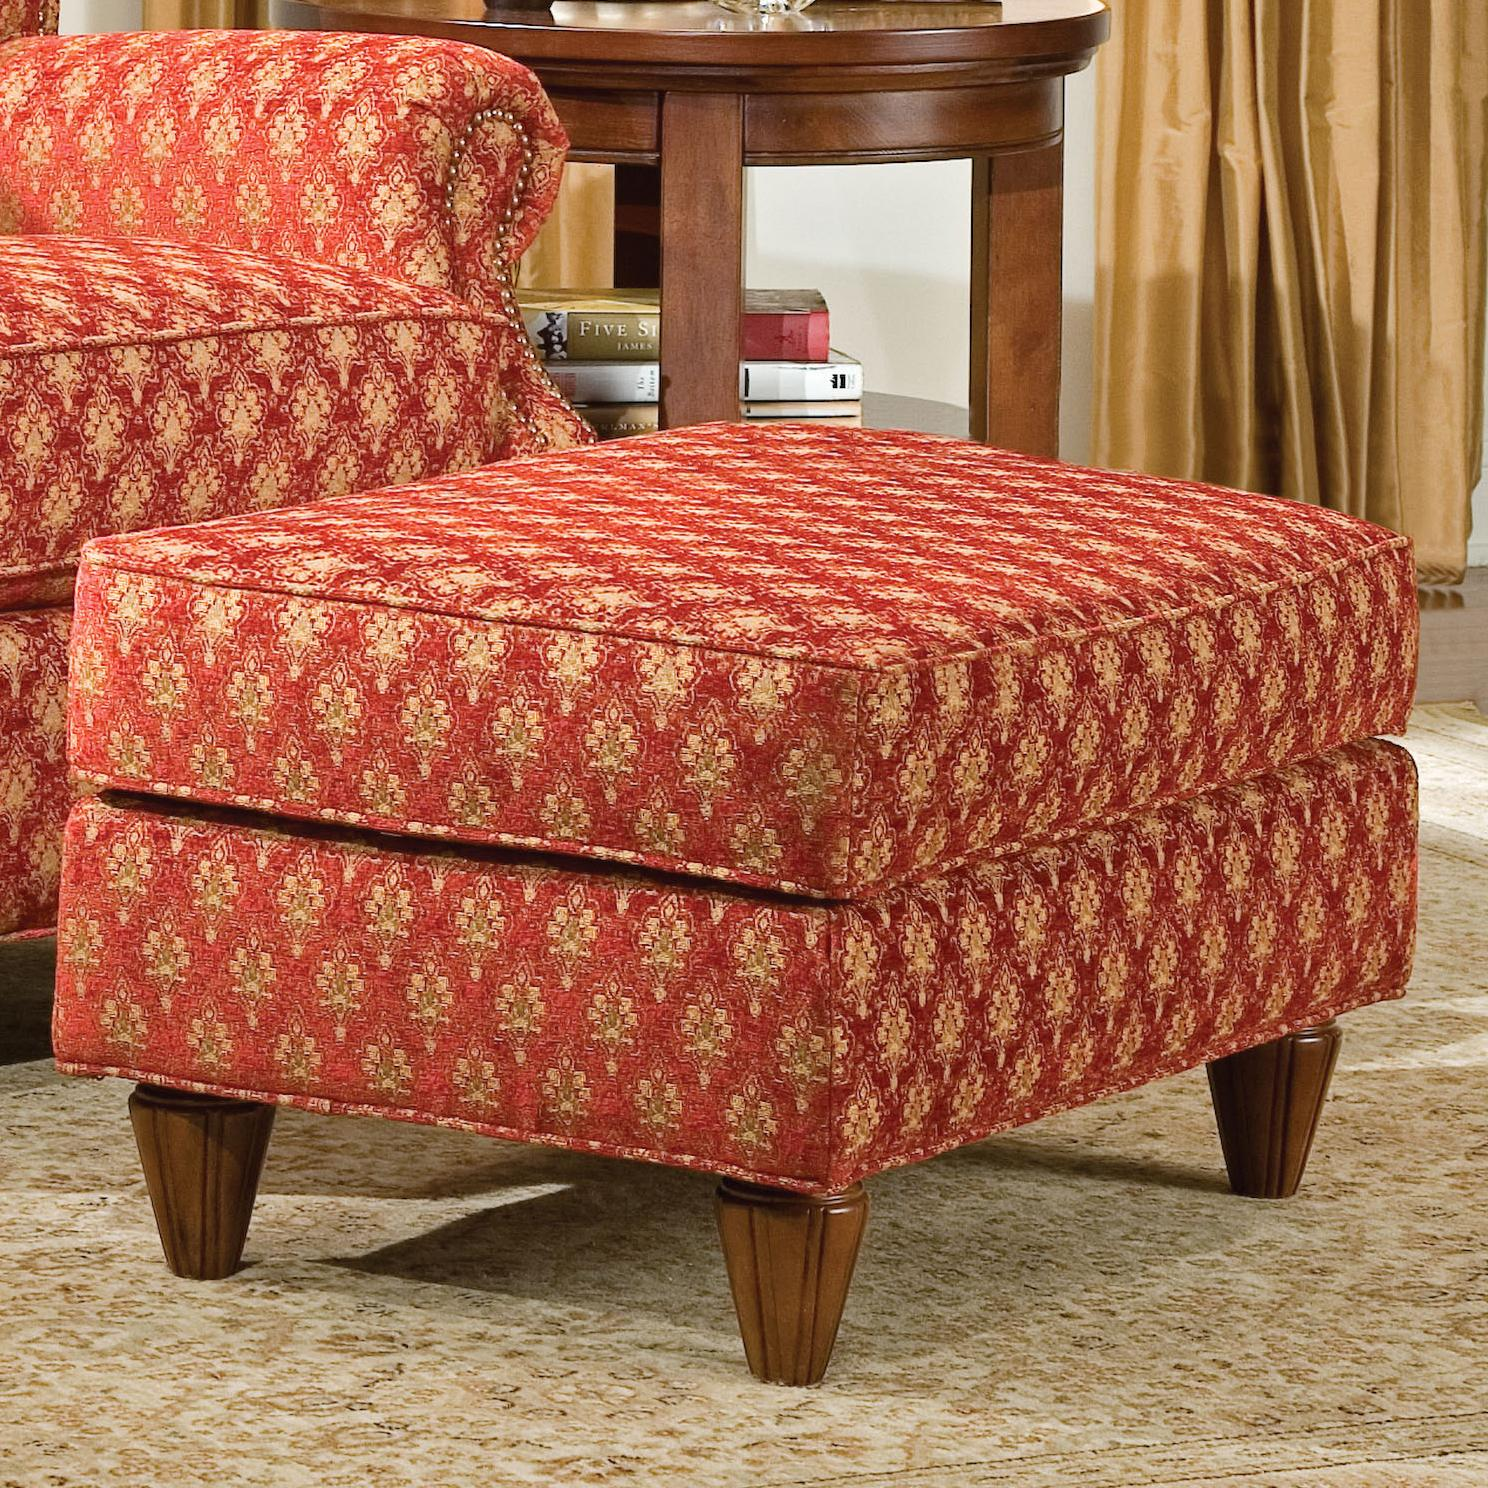 1403 Ottoman by Grove Park at Sprintz Furniture